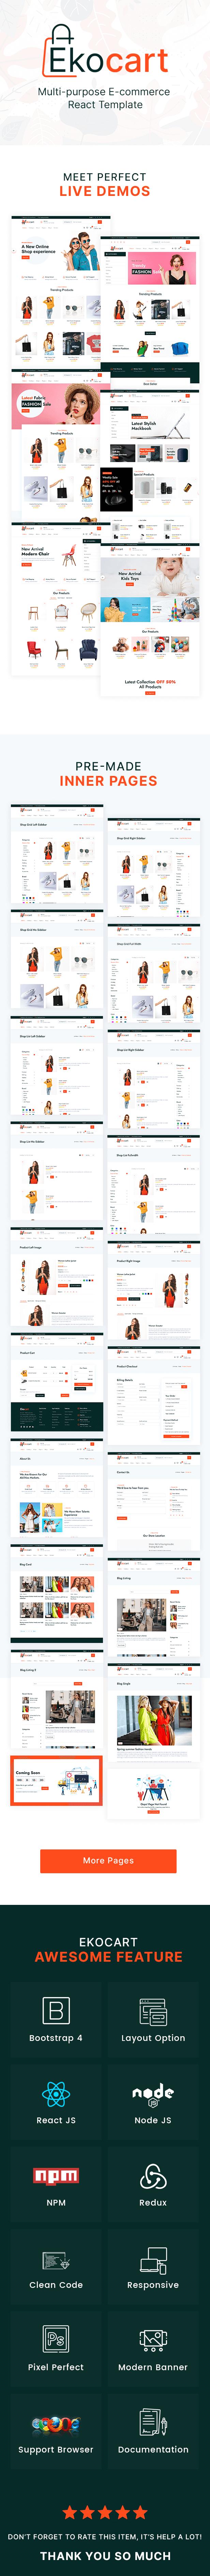 Ekocart- Multi-purpose E-commerce React Template - 2